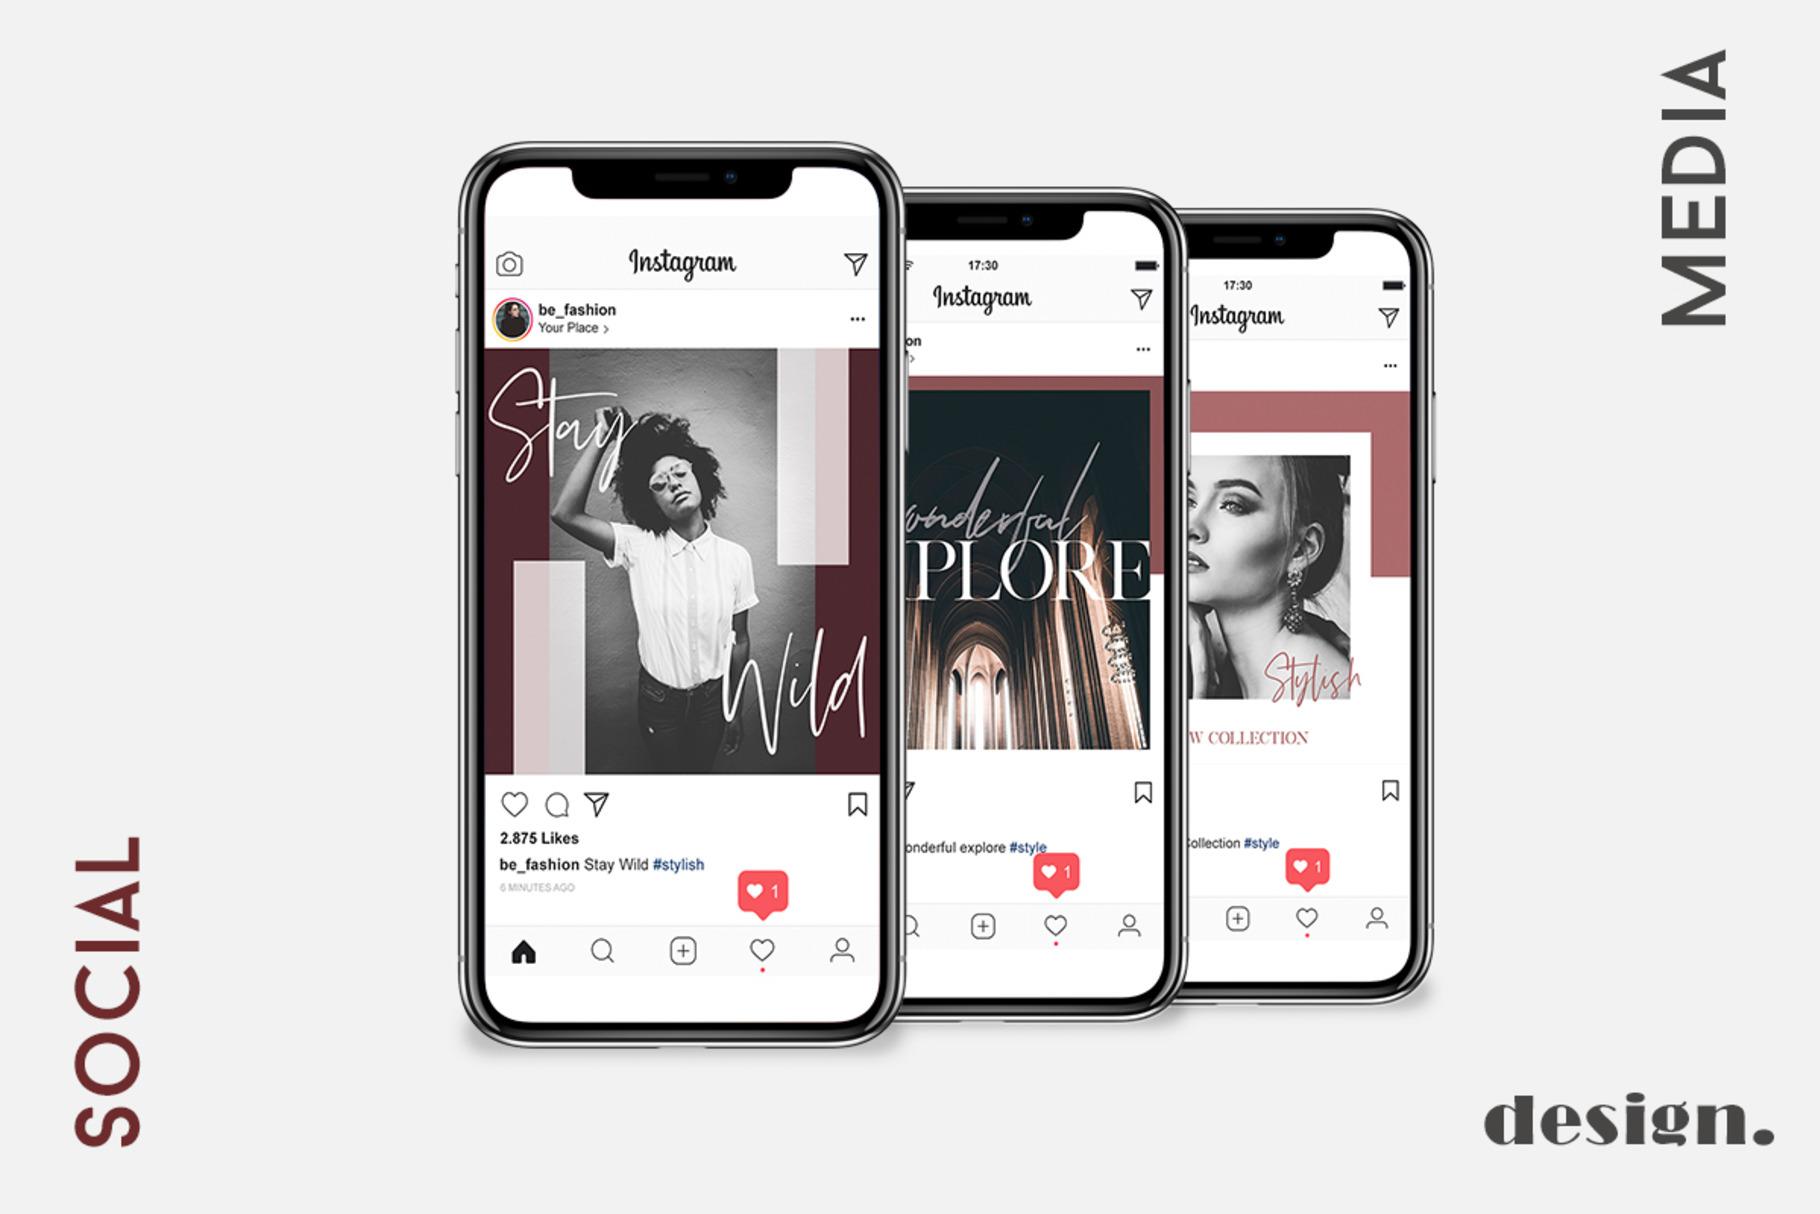 Stylish Social Media Pack - Instagram example image 3